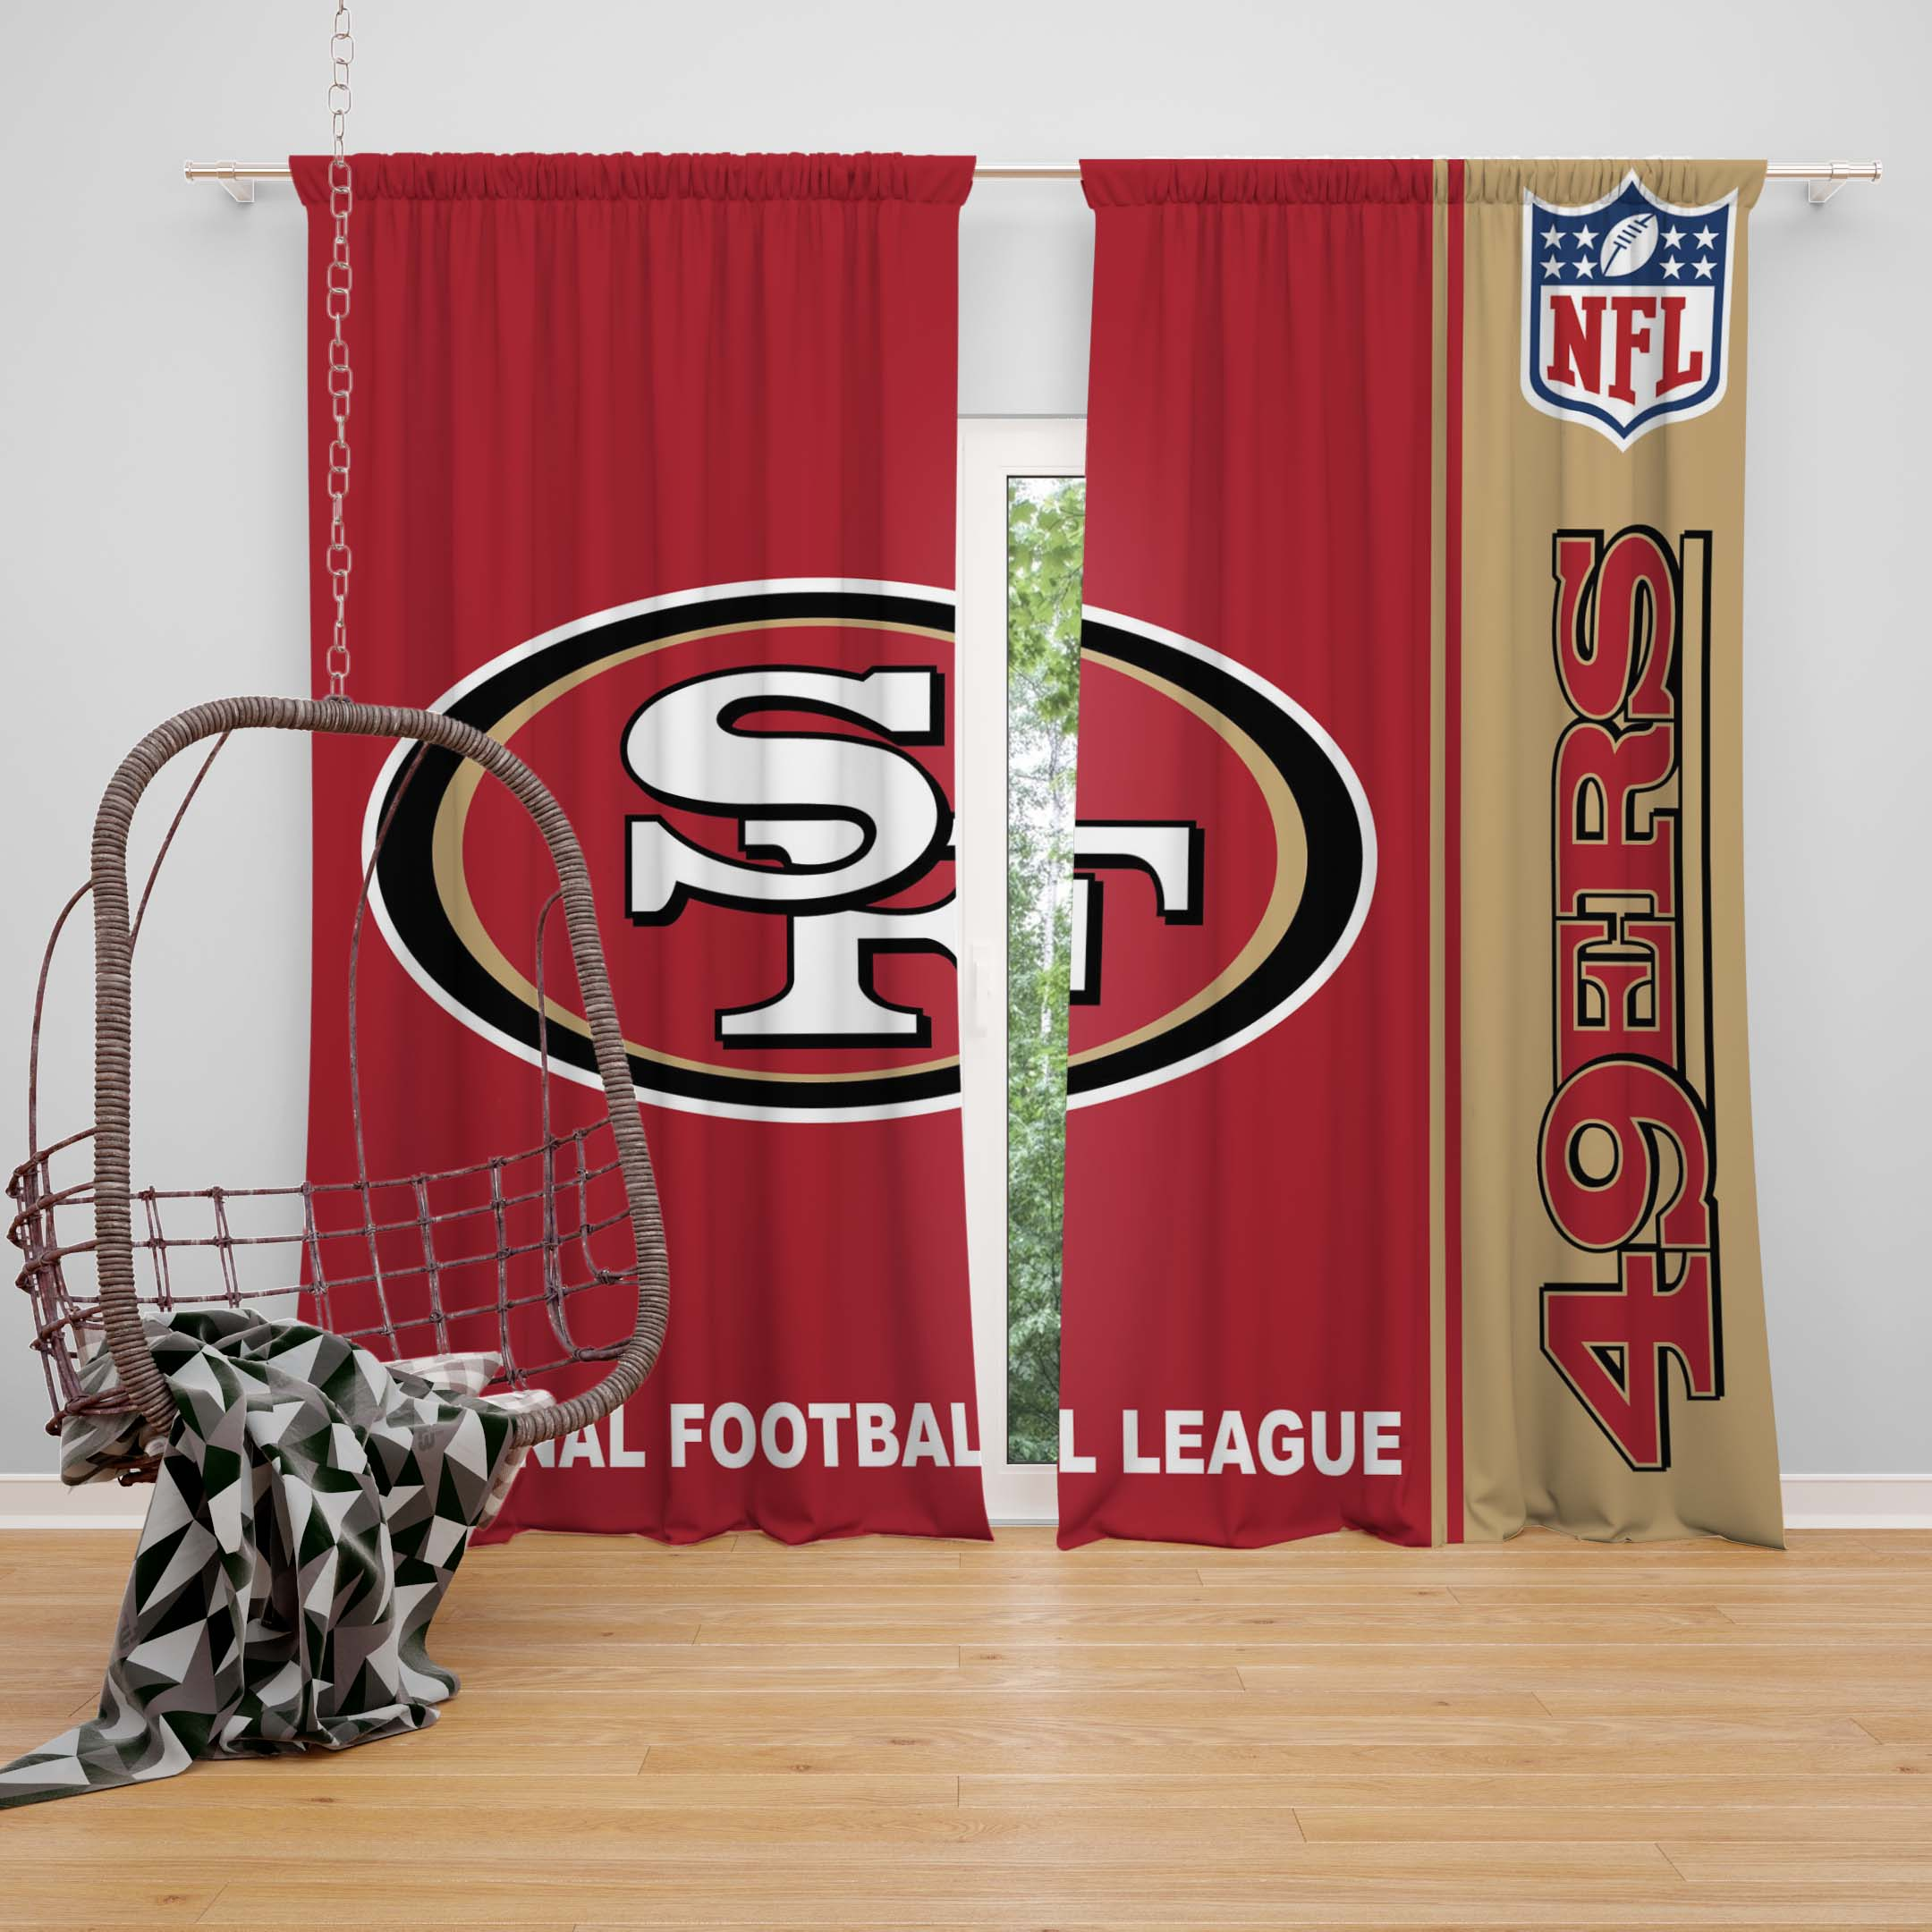 Nfl San Francisco 49ers Bedroom Curtain Ebeddingsets